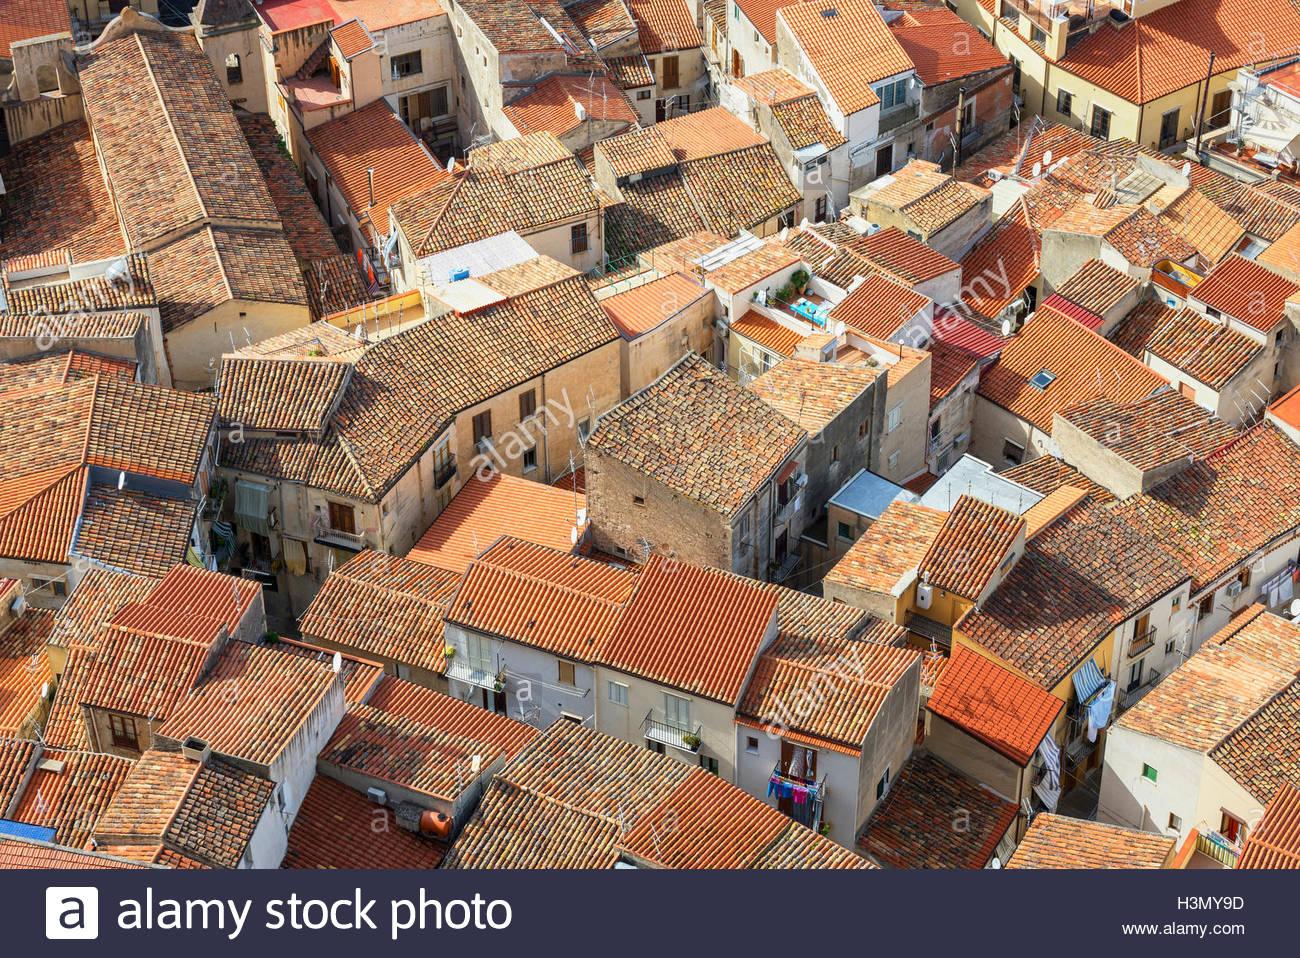 High angle view of Cefalu toits en terre cuite de La Rocca, Sicile, Italie Photo Stock